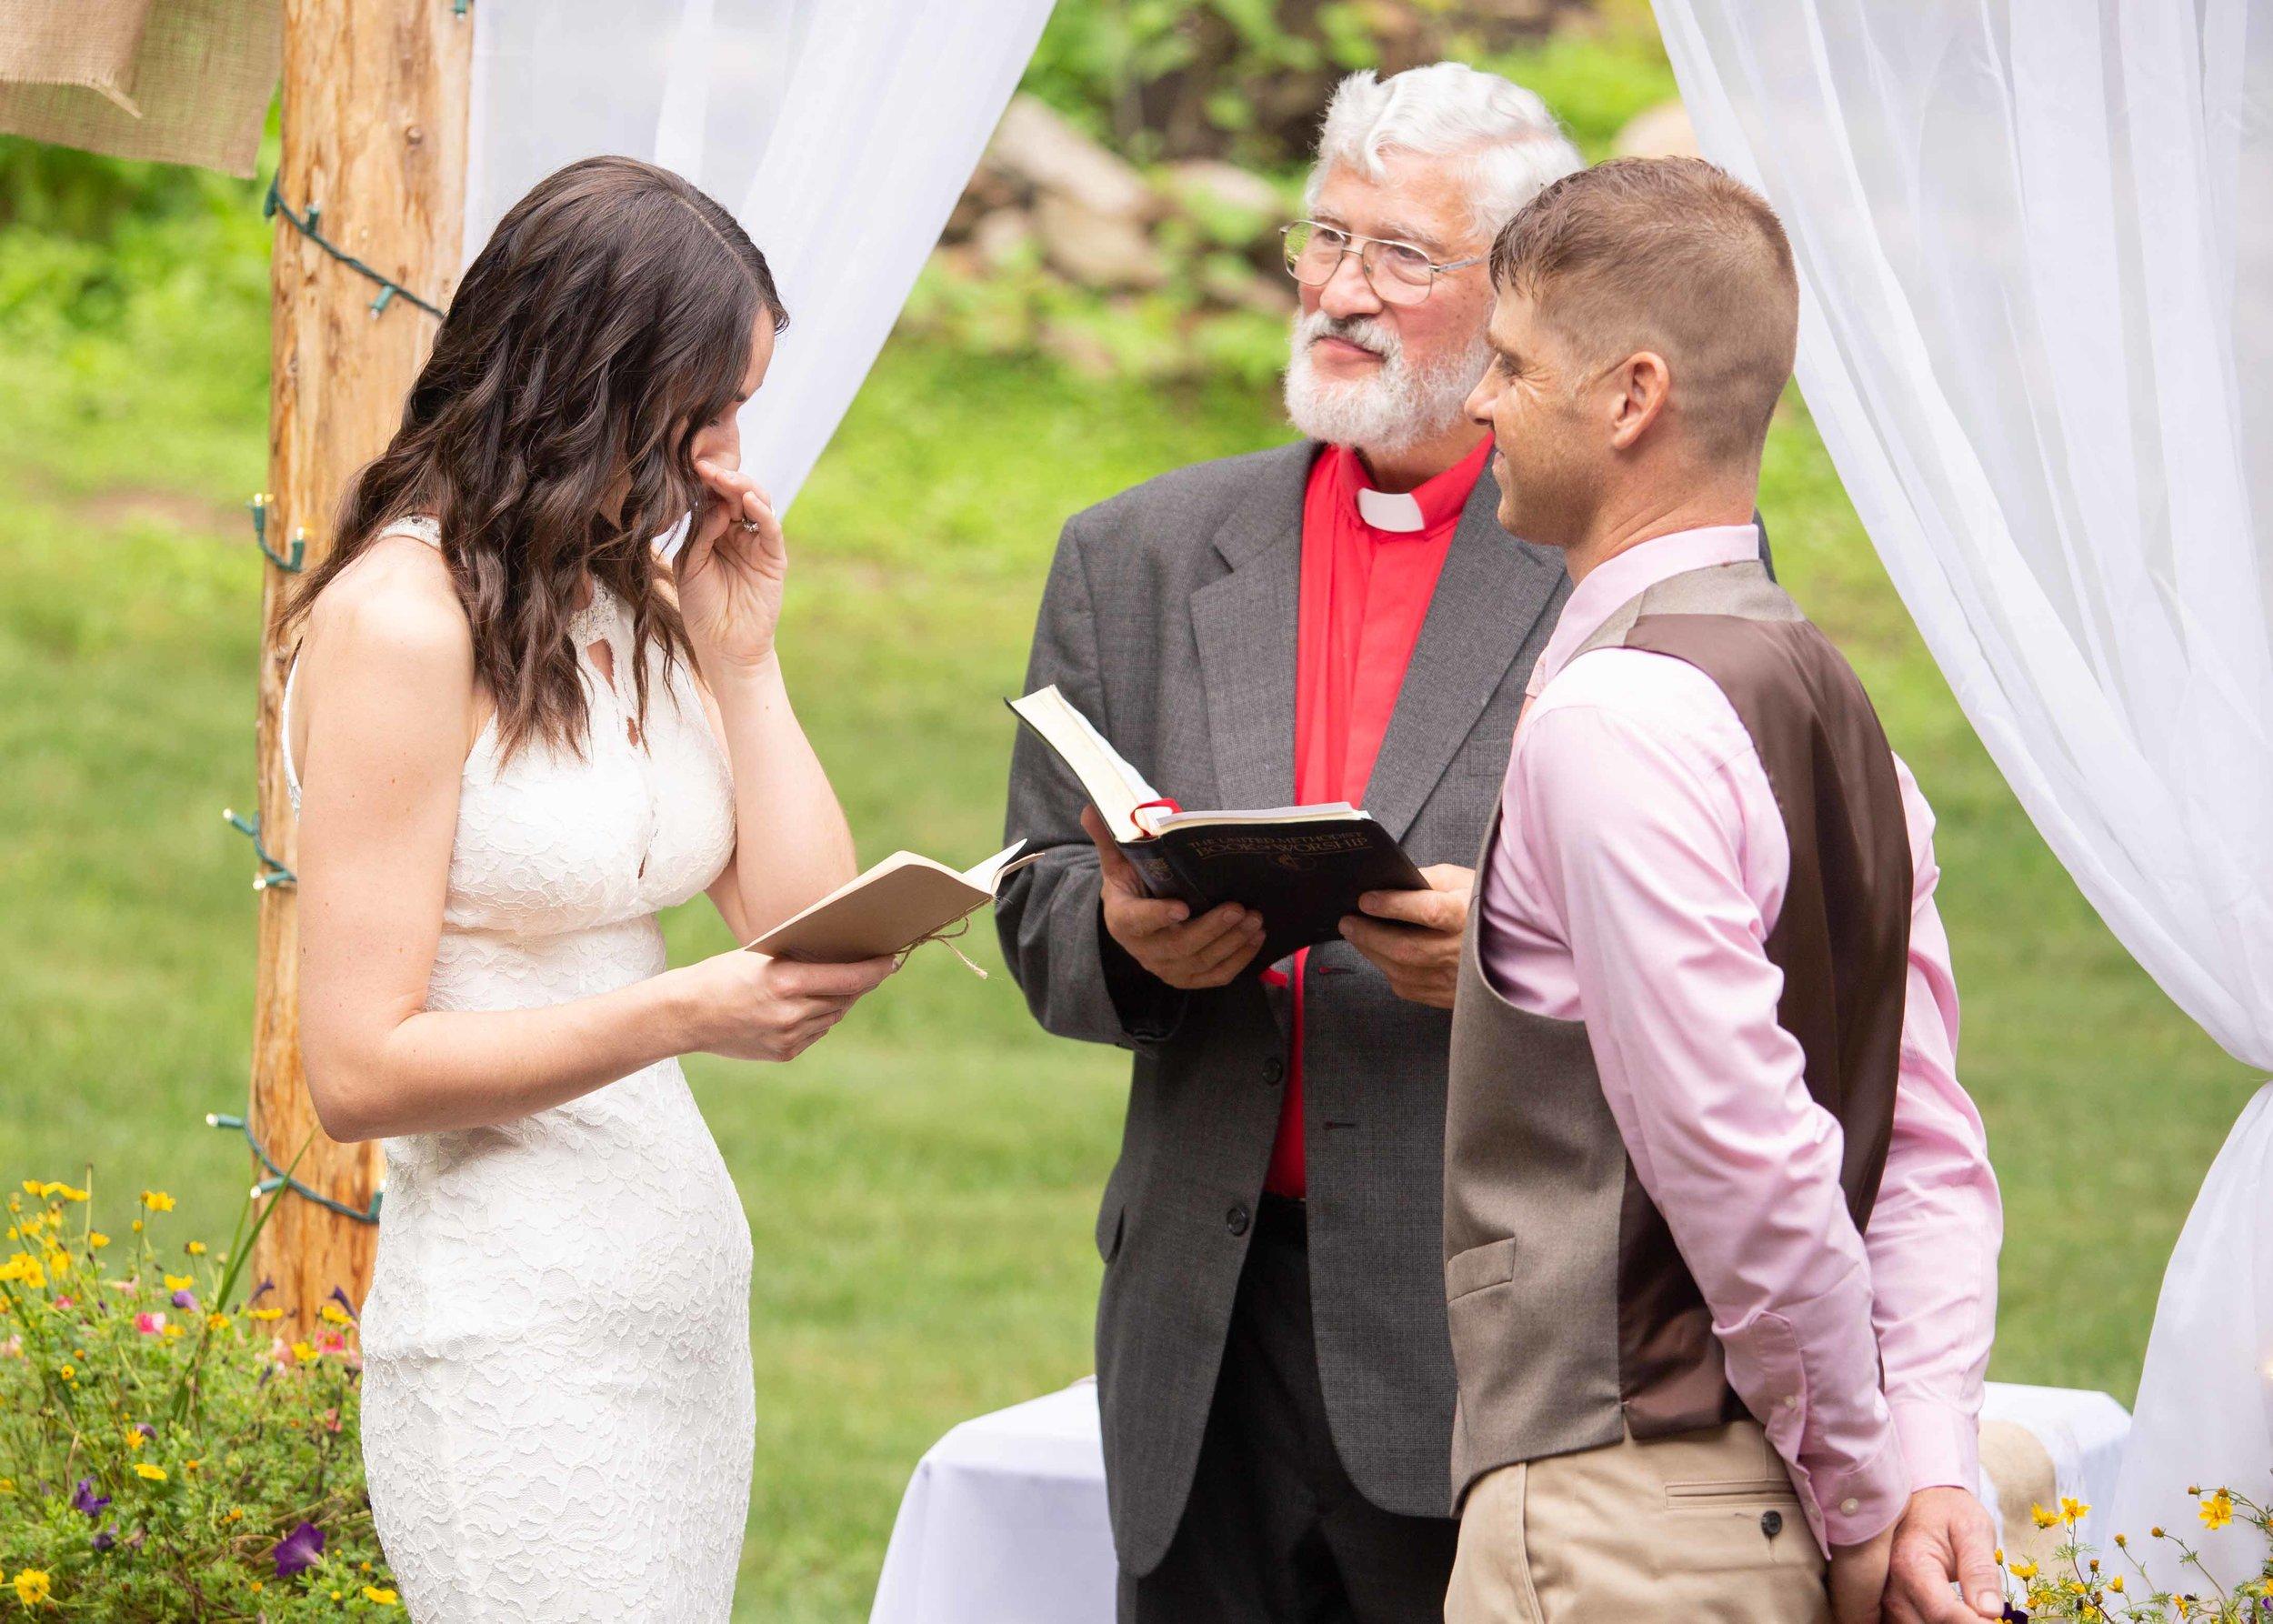 Vow Renewal, Wedding Photography-12.jpg